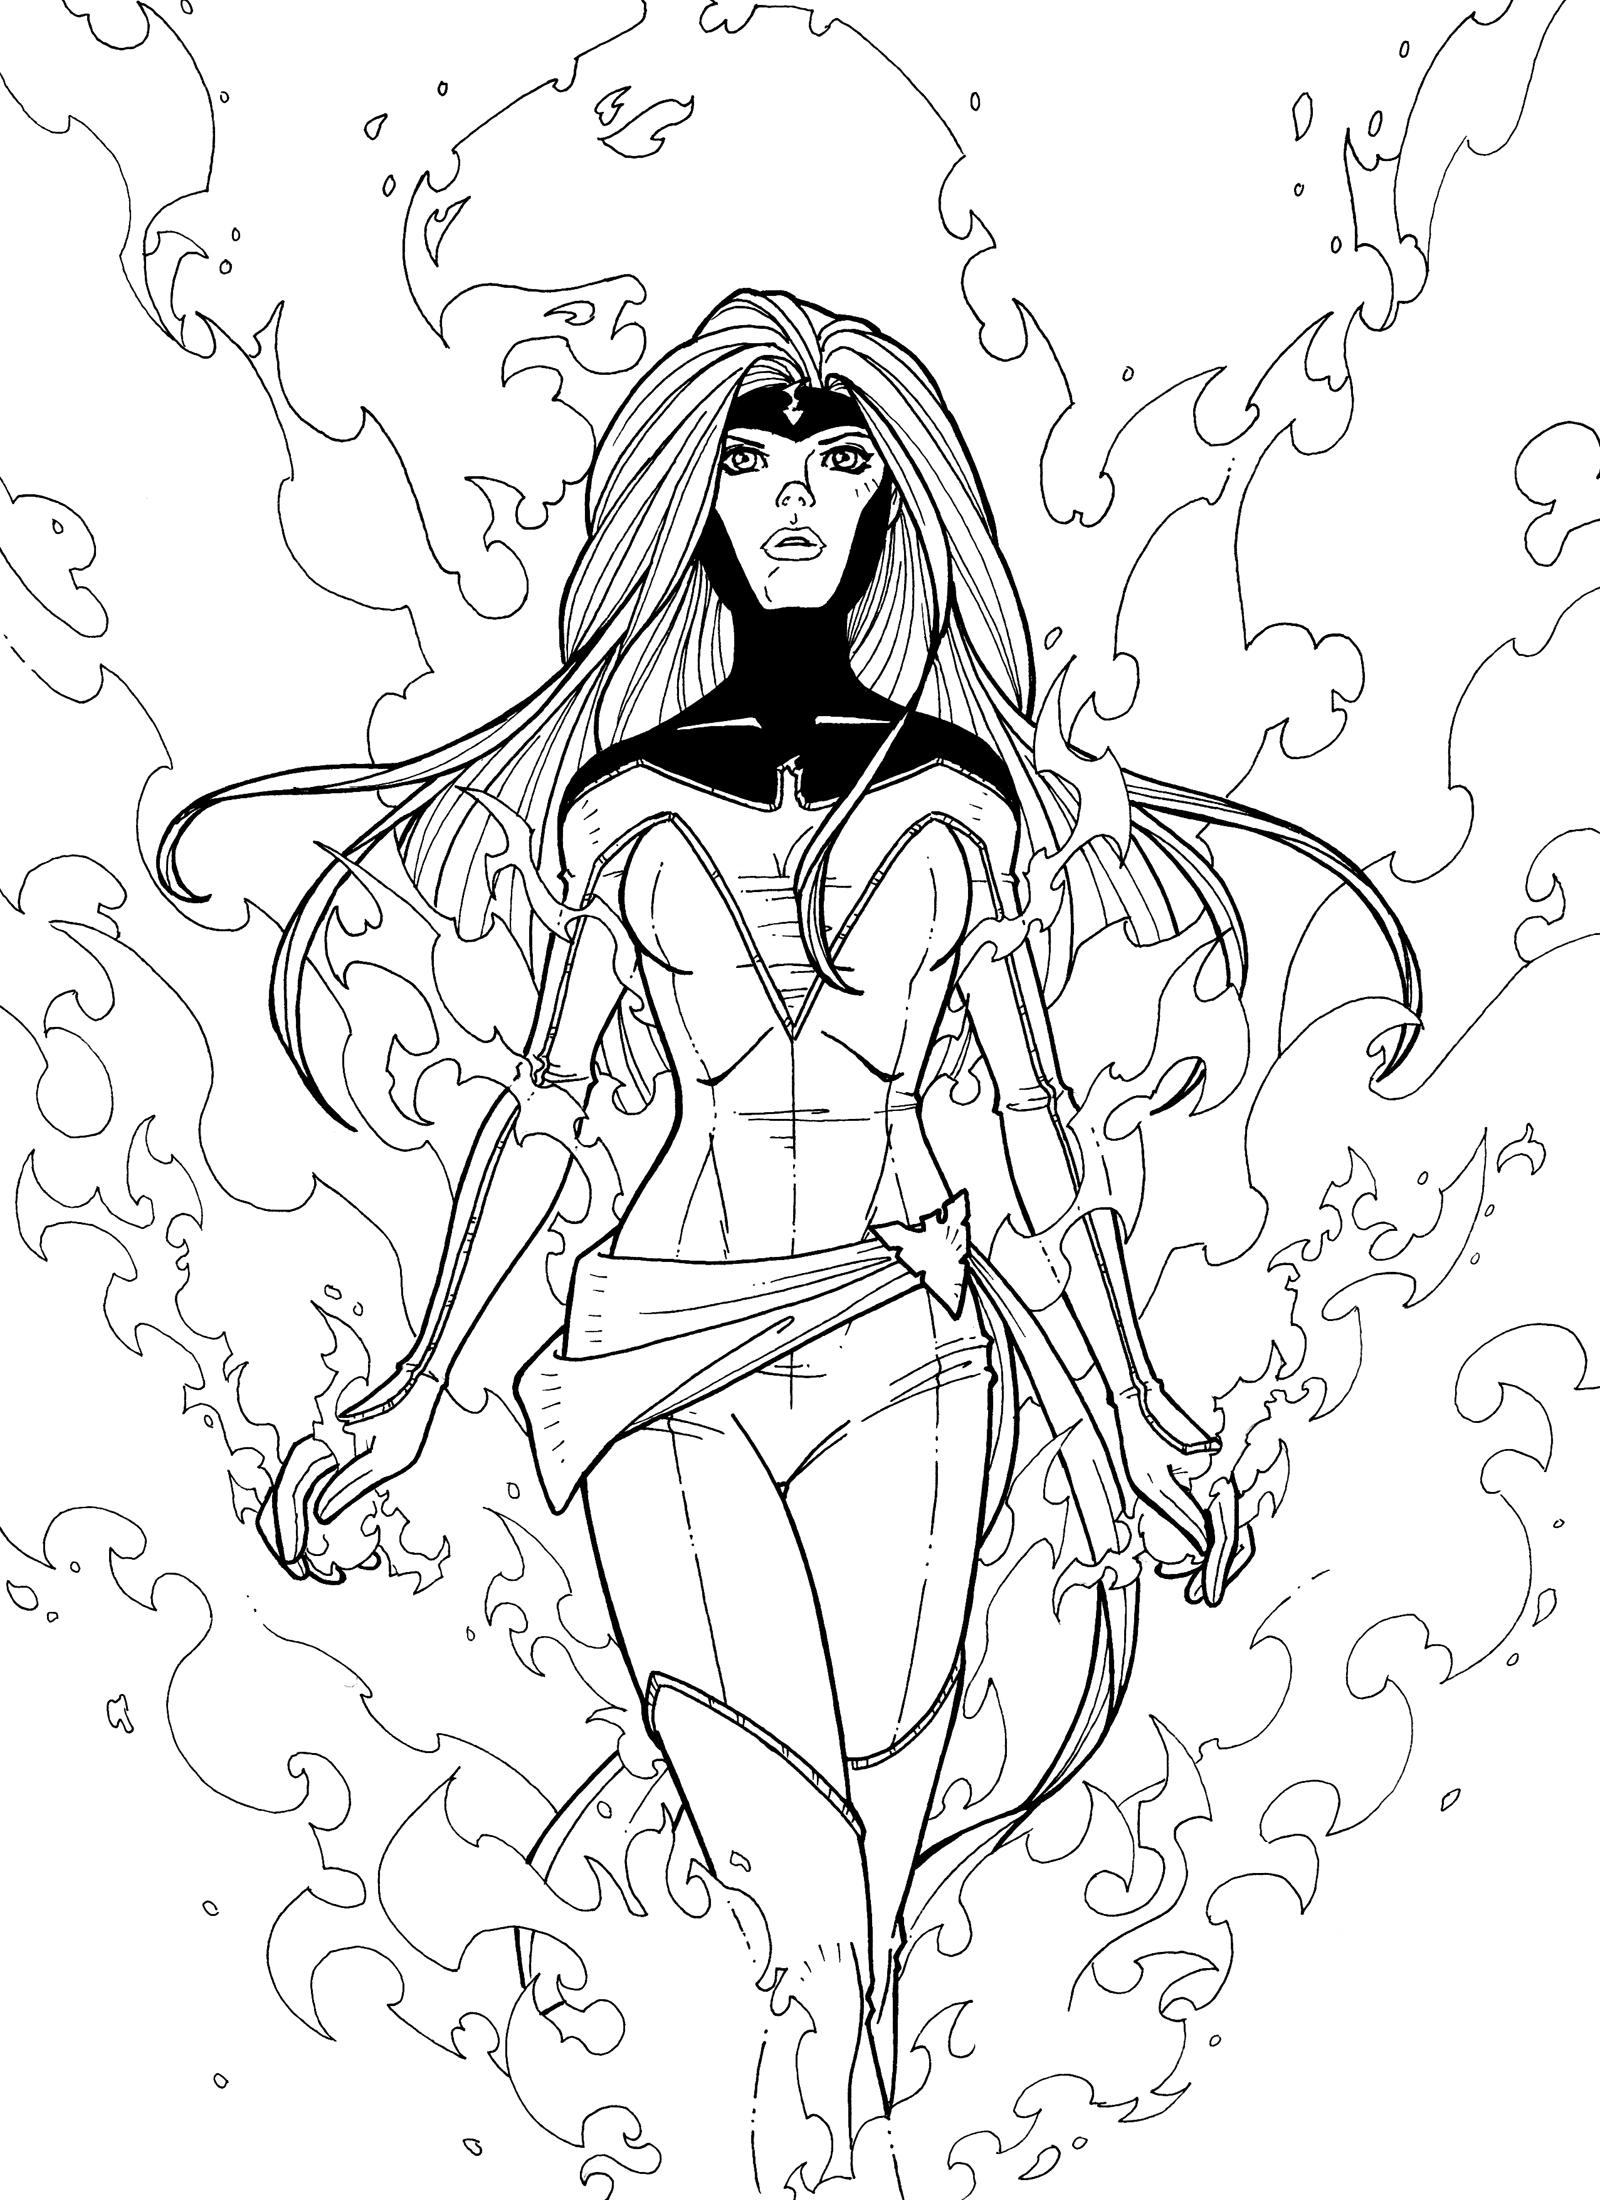 X men coloring pages | Superhero coloring pages, Superhero ... | 2200x1600